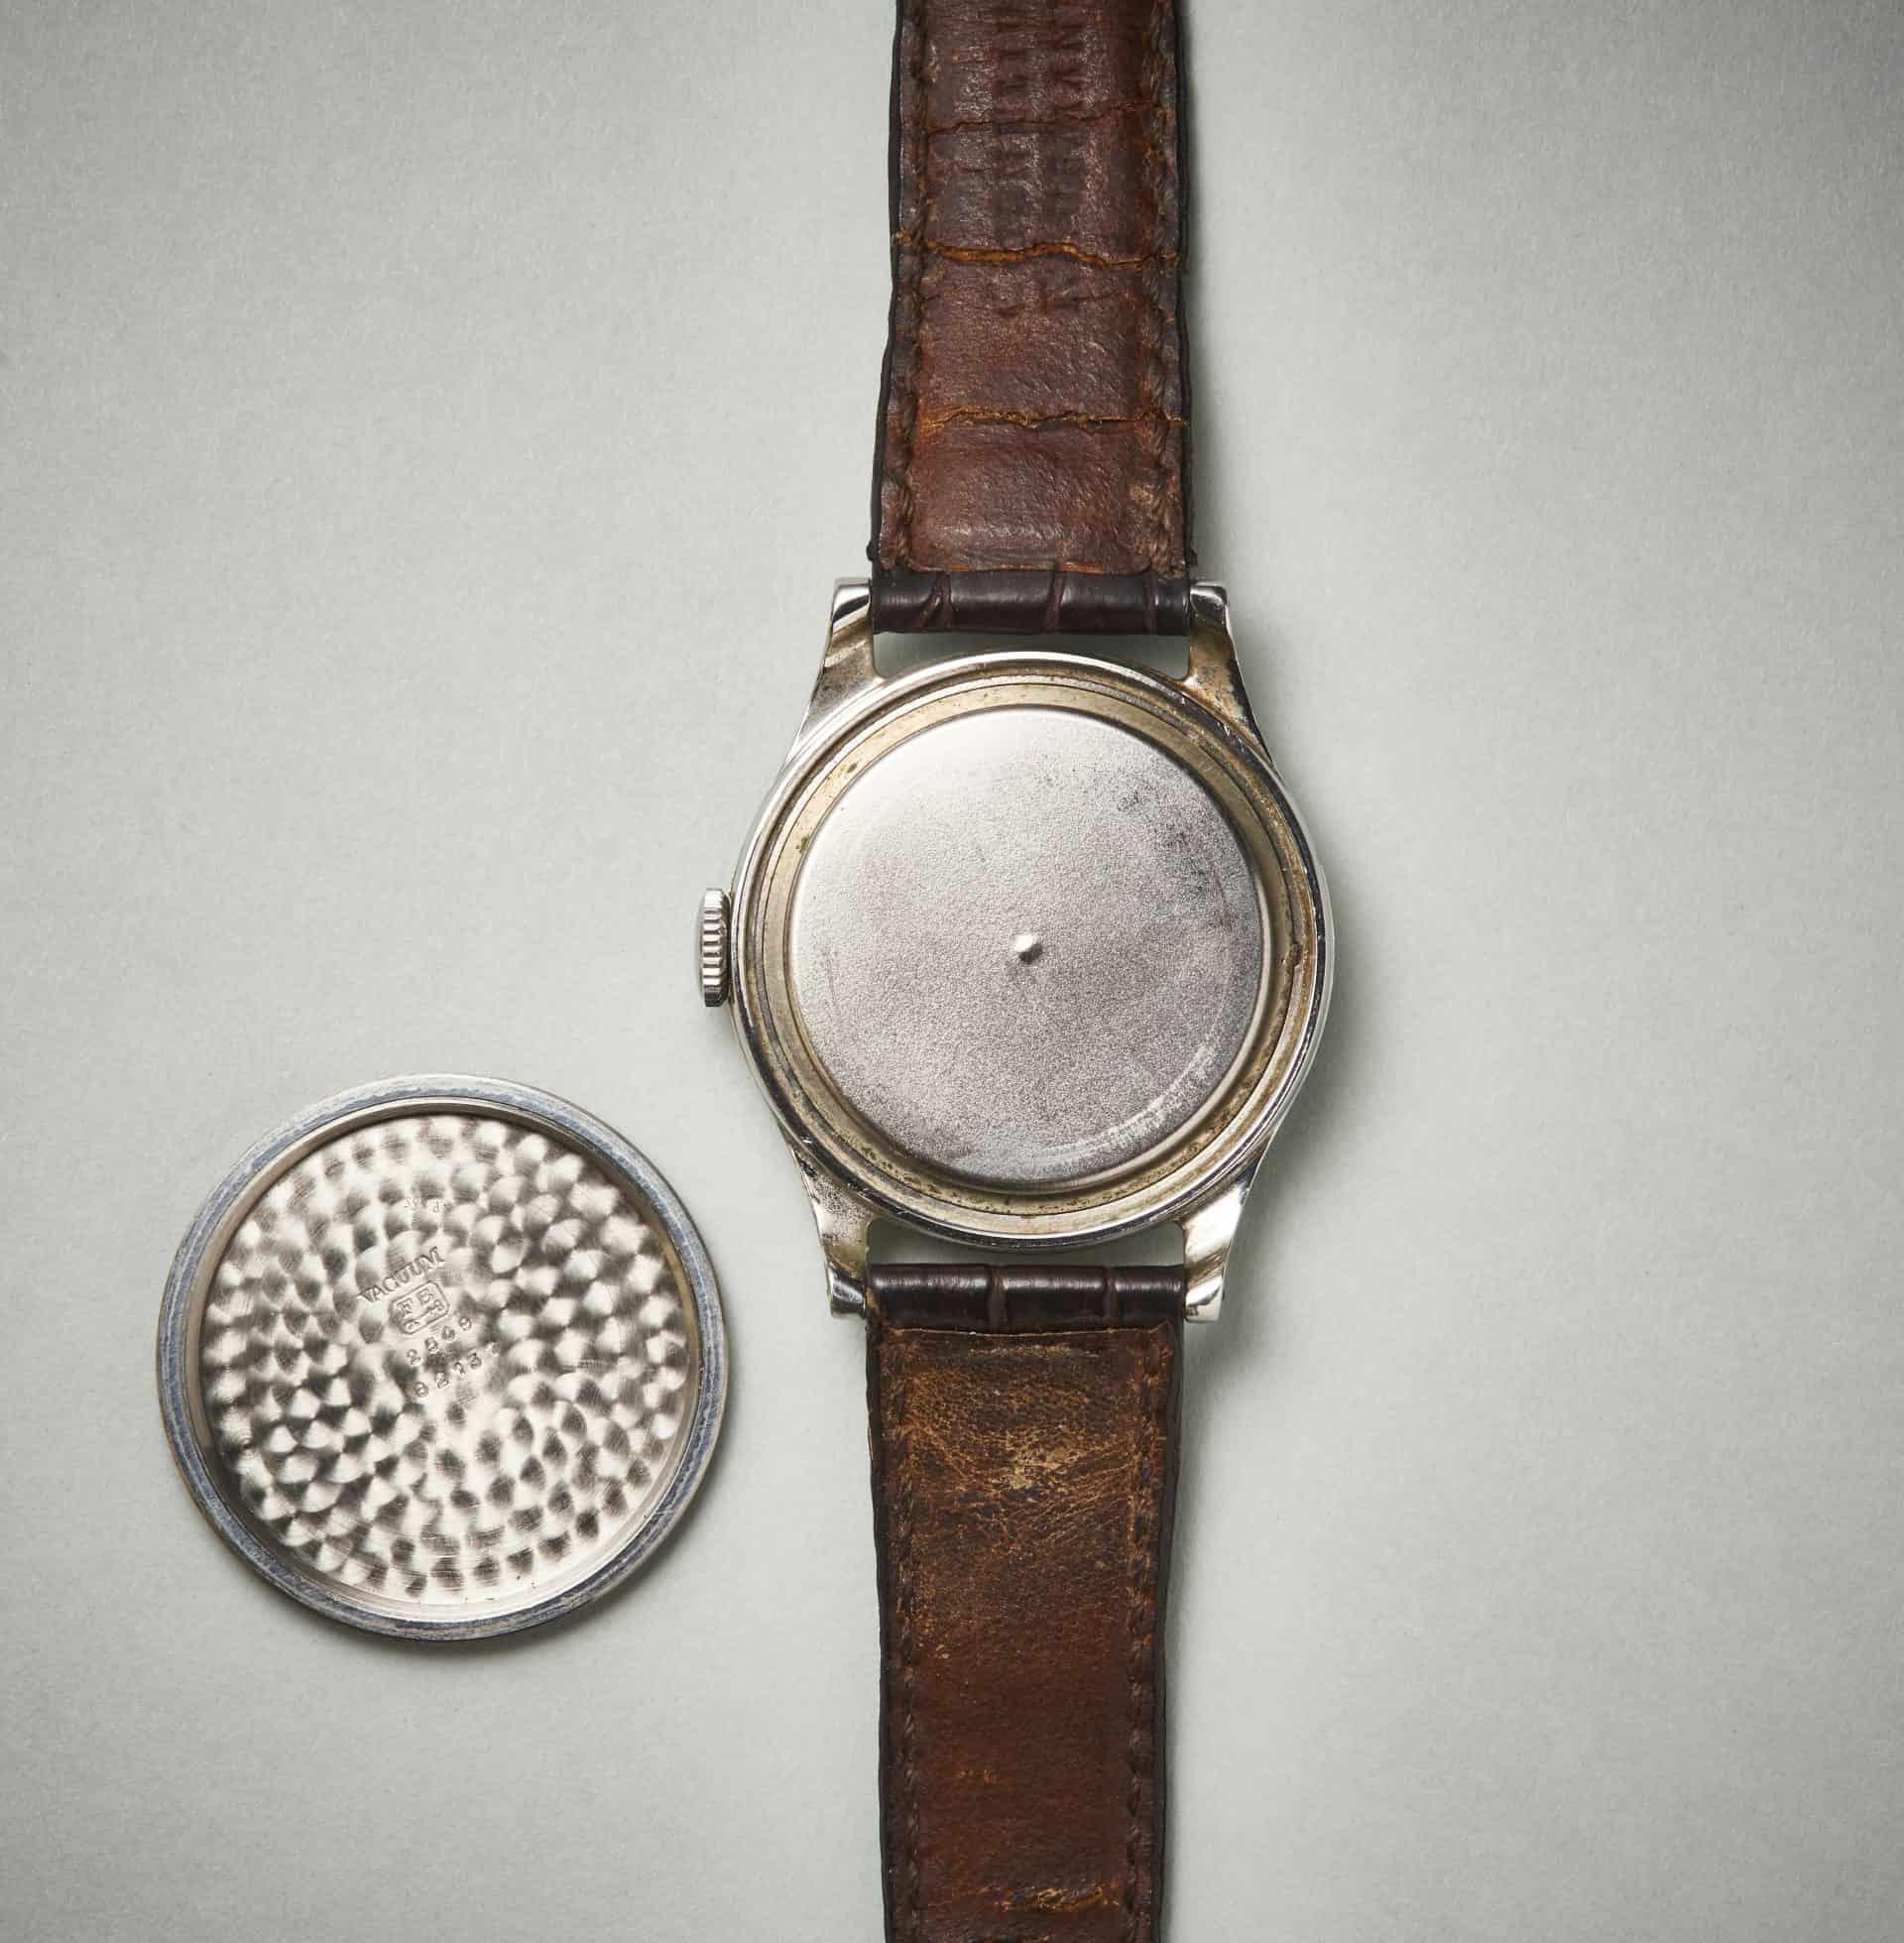 Ecole dHorlogerie Geneve Patek Philippe Ref 2509 Staubdeckel Uhrenkosmos